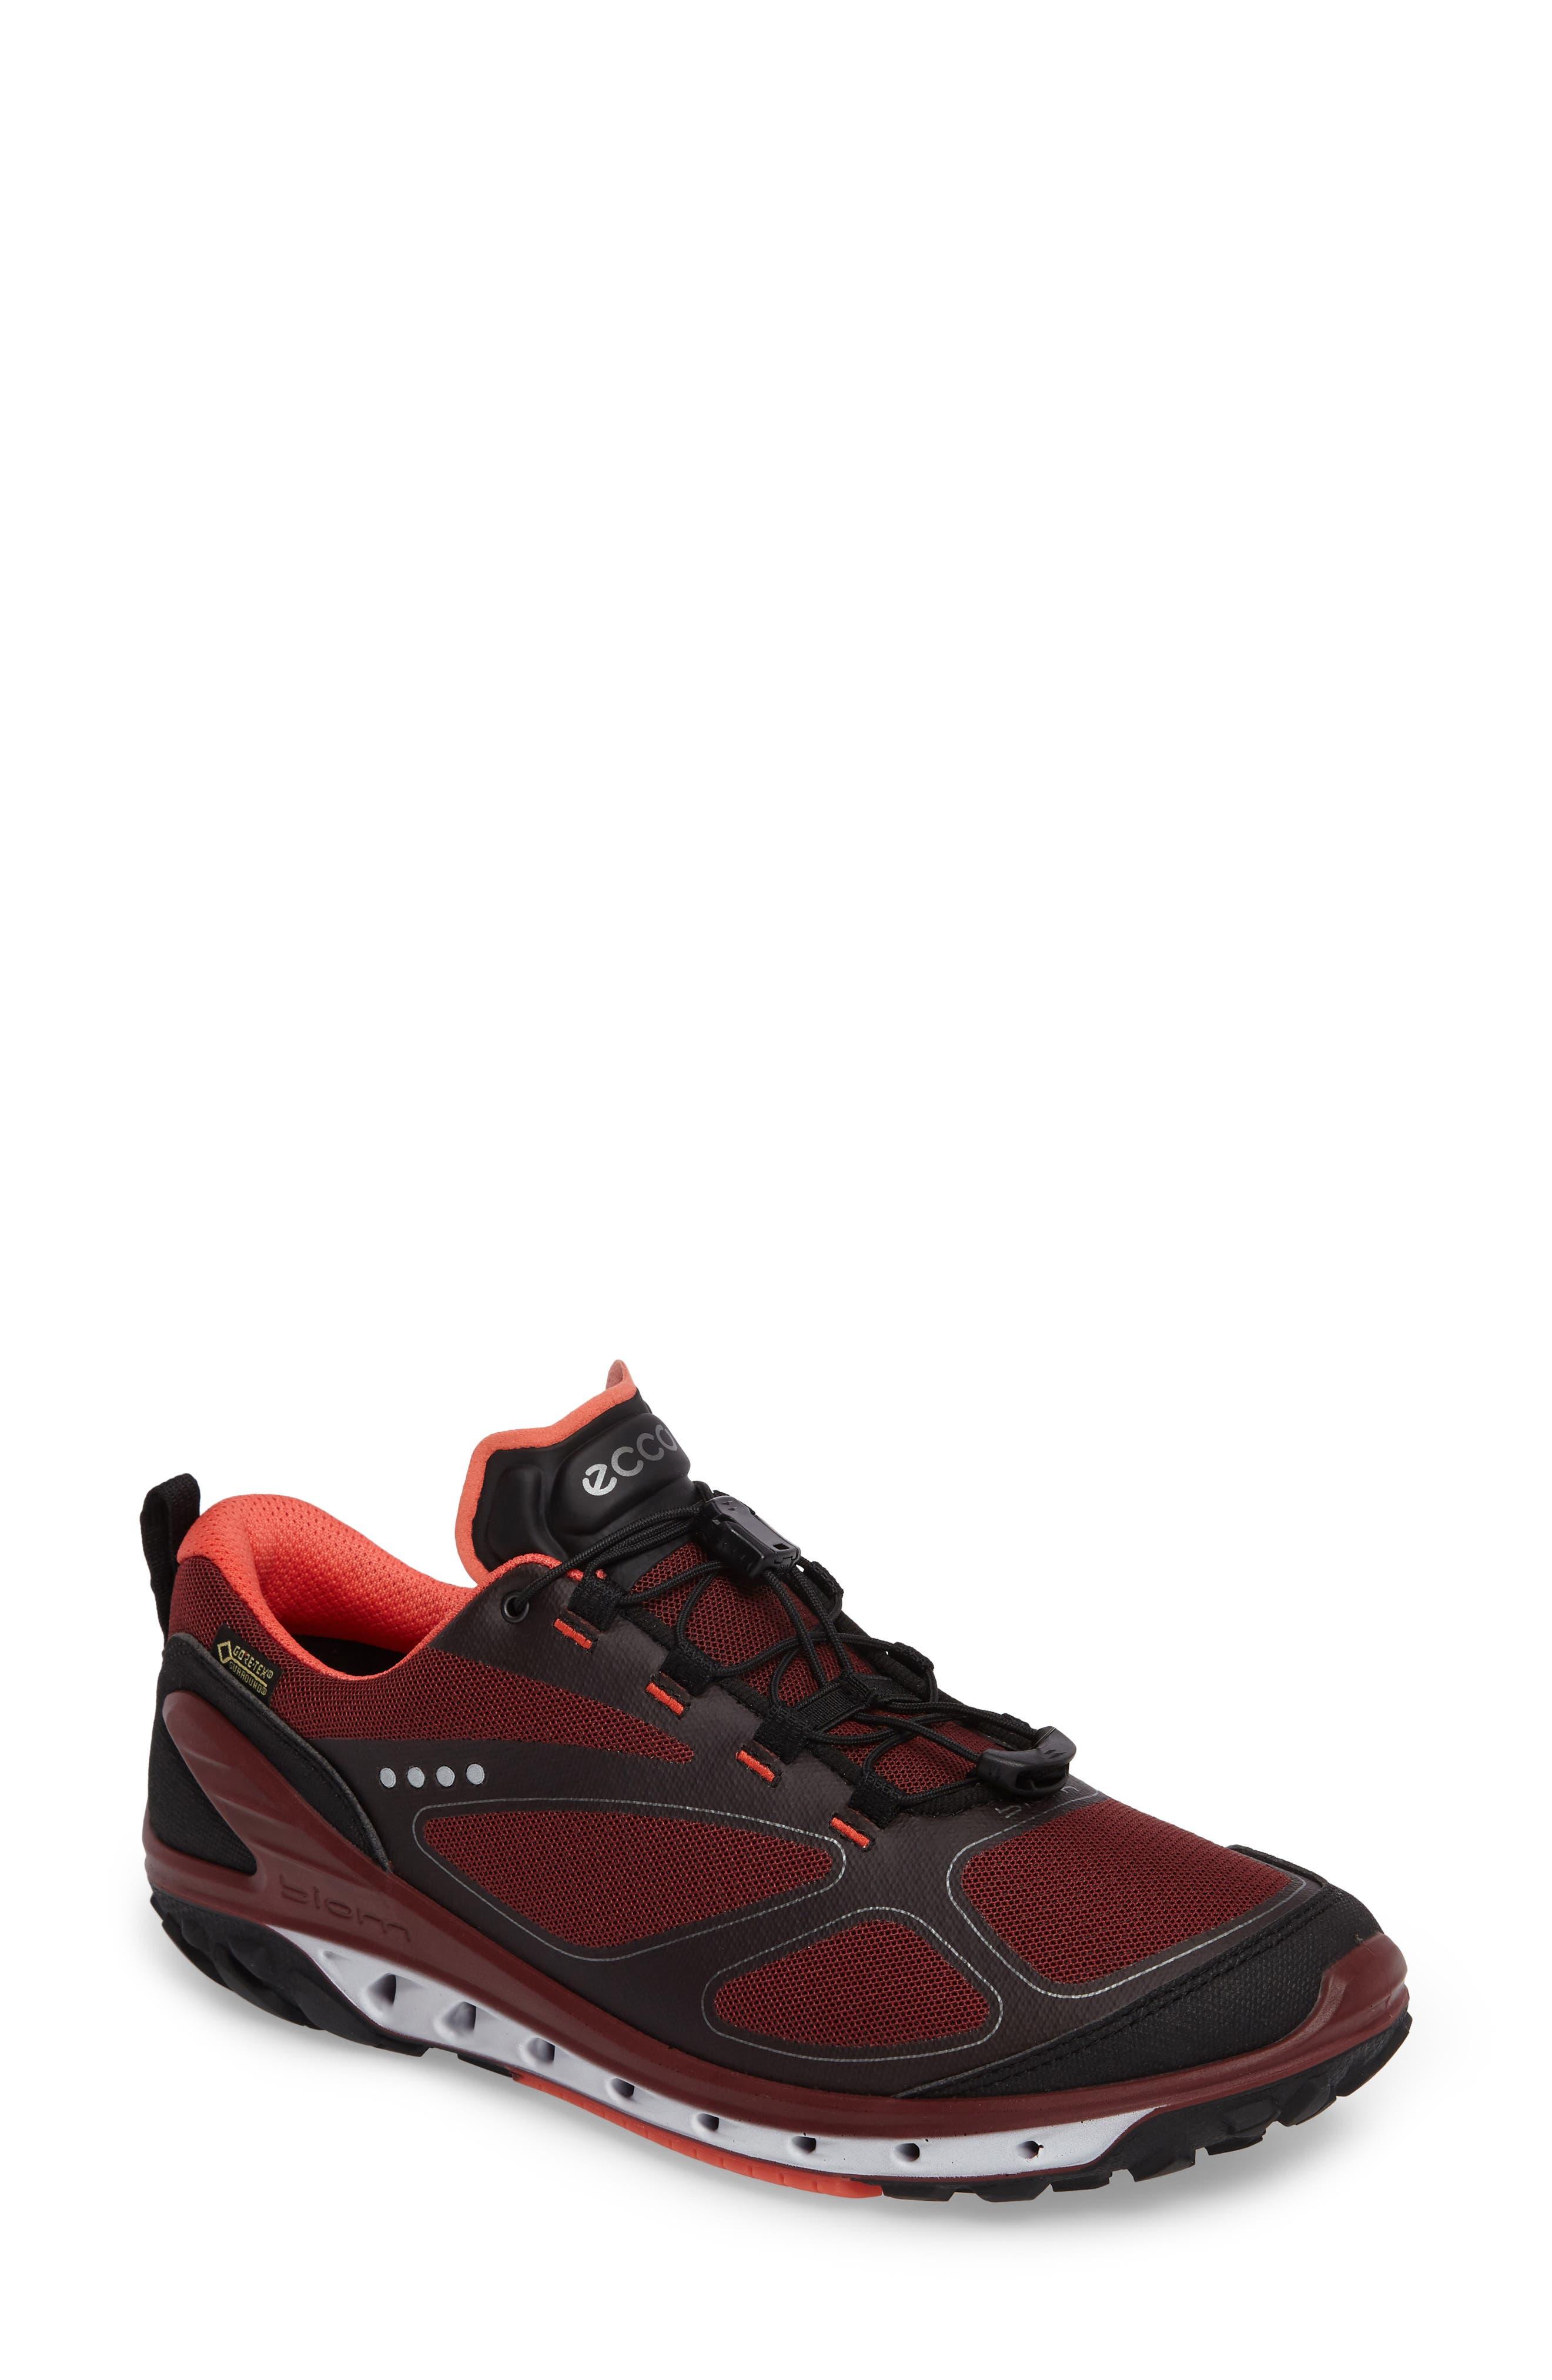 BIOM Venture GTX Sneaker,                             Main thumbnail 1, color,                             Black/ Coral Blush Fabric